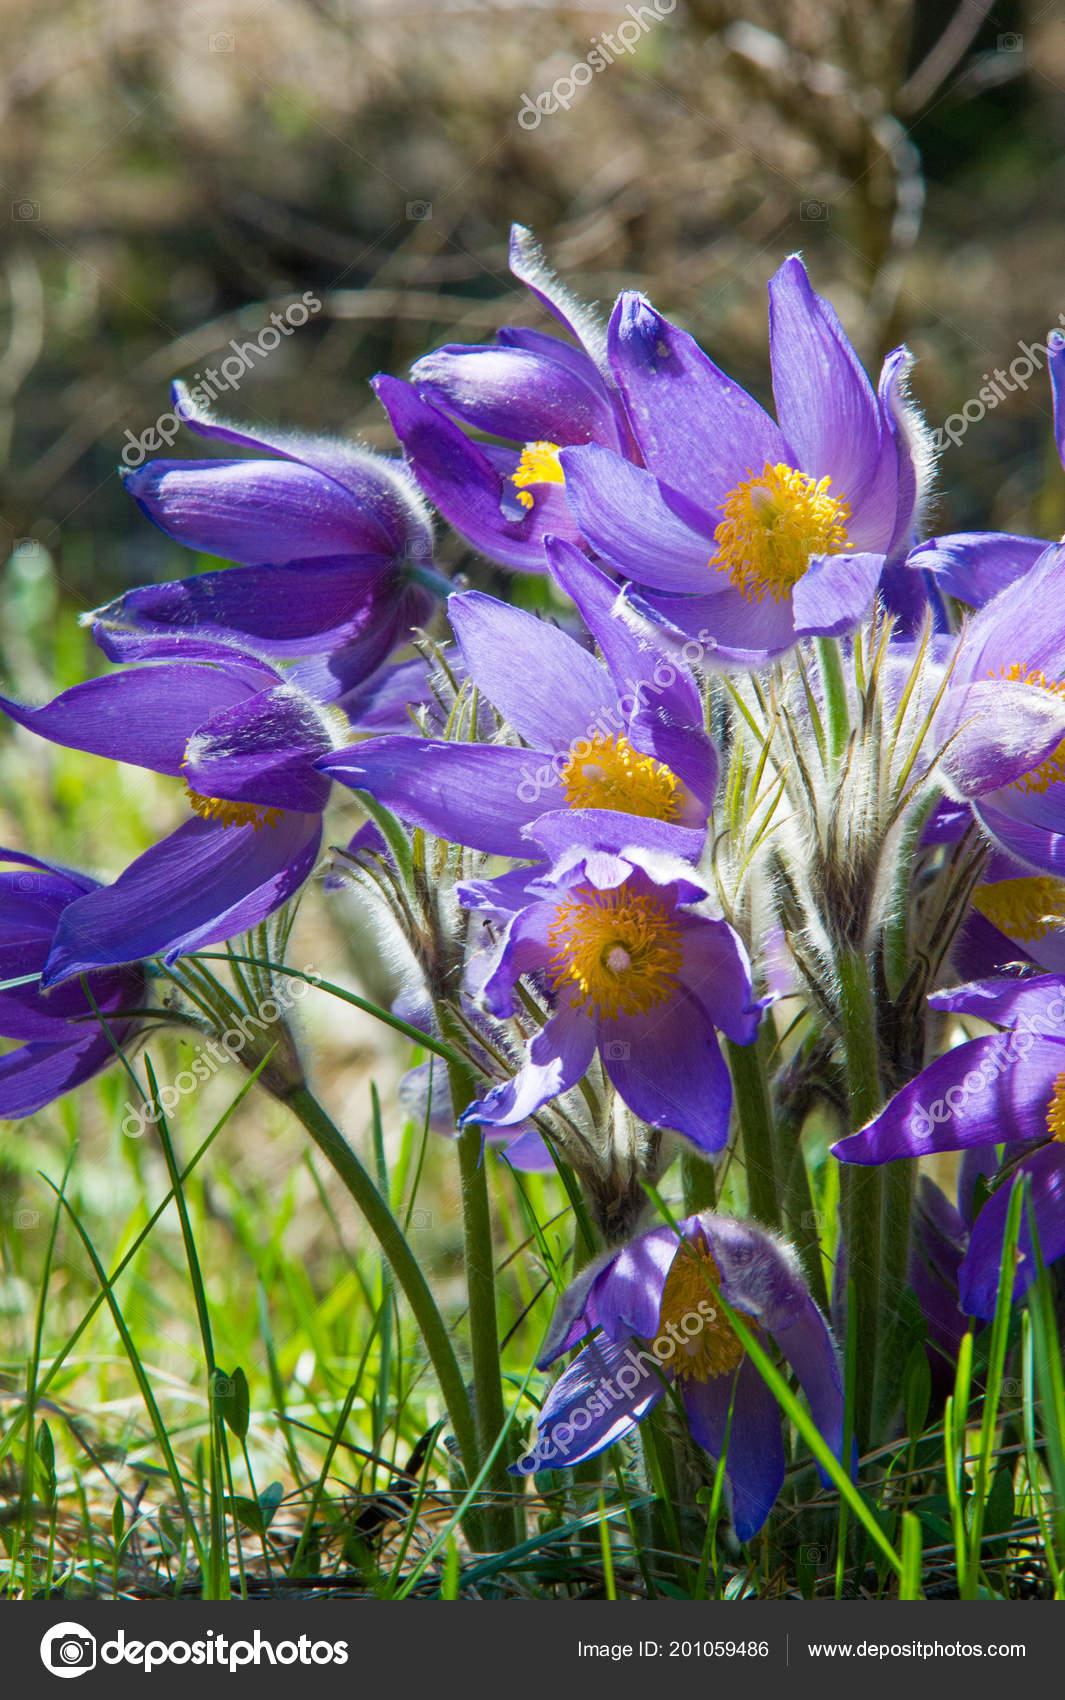 Spring landscape flowers growing wild spring flower pulsatilla spring landscape flowers growing wild spring flower pulsatilla common names stock photo mightylinksfo